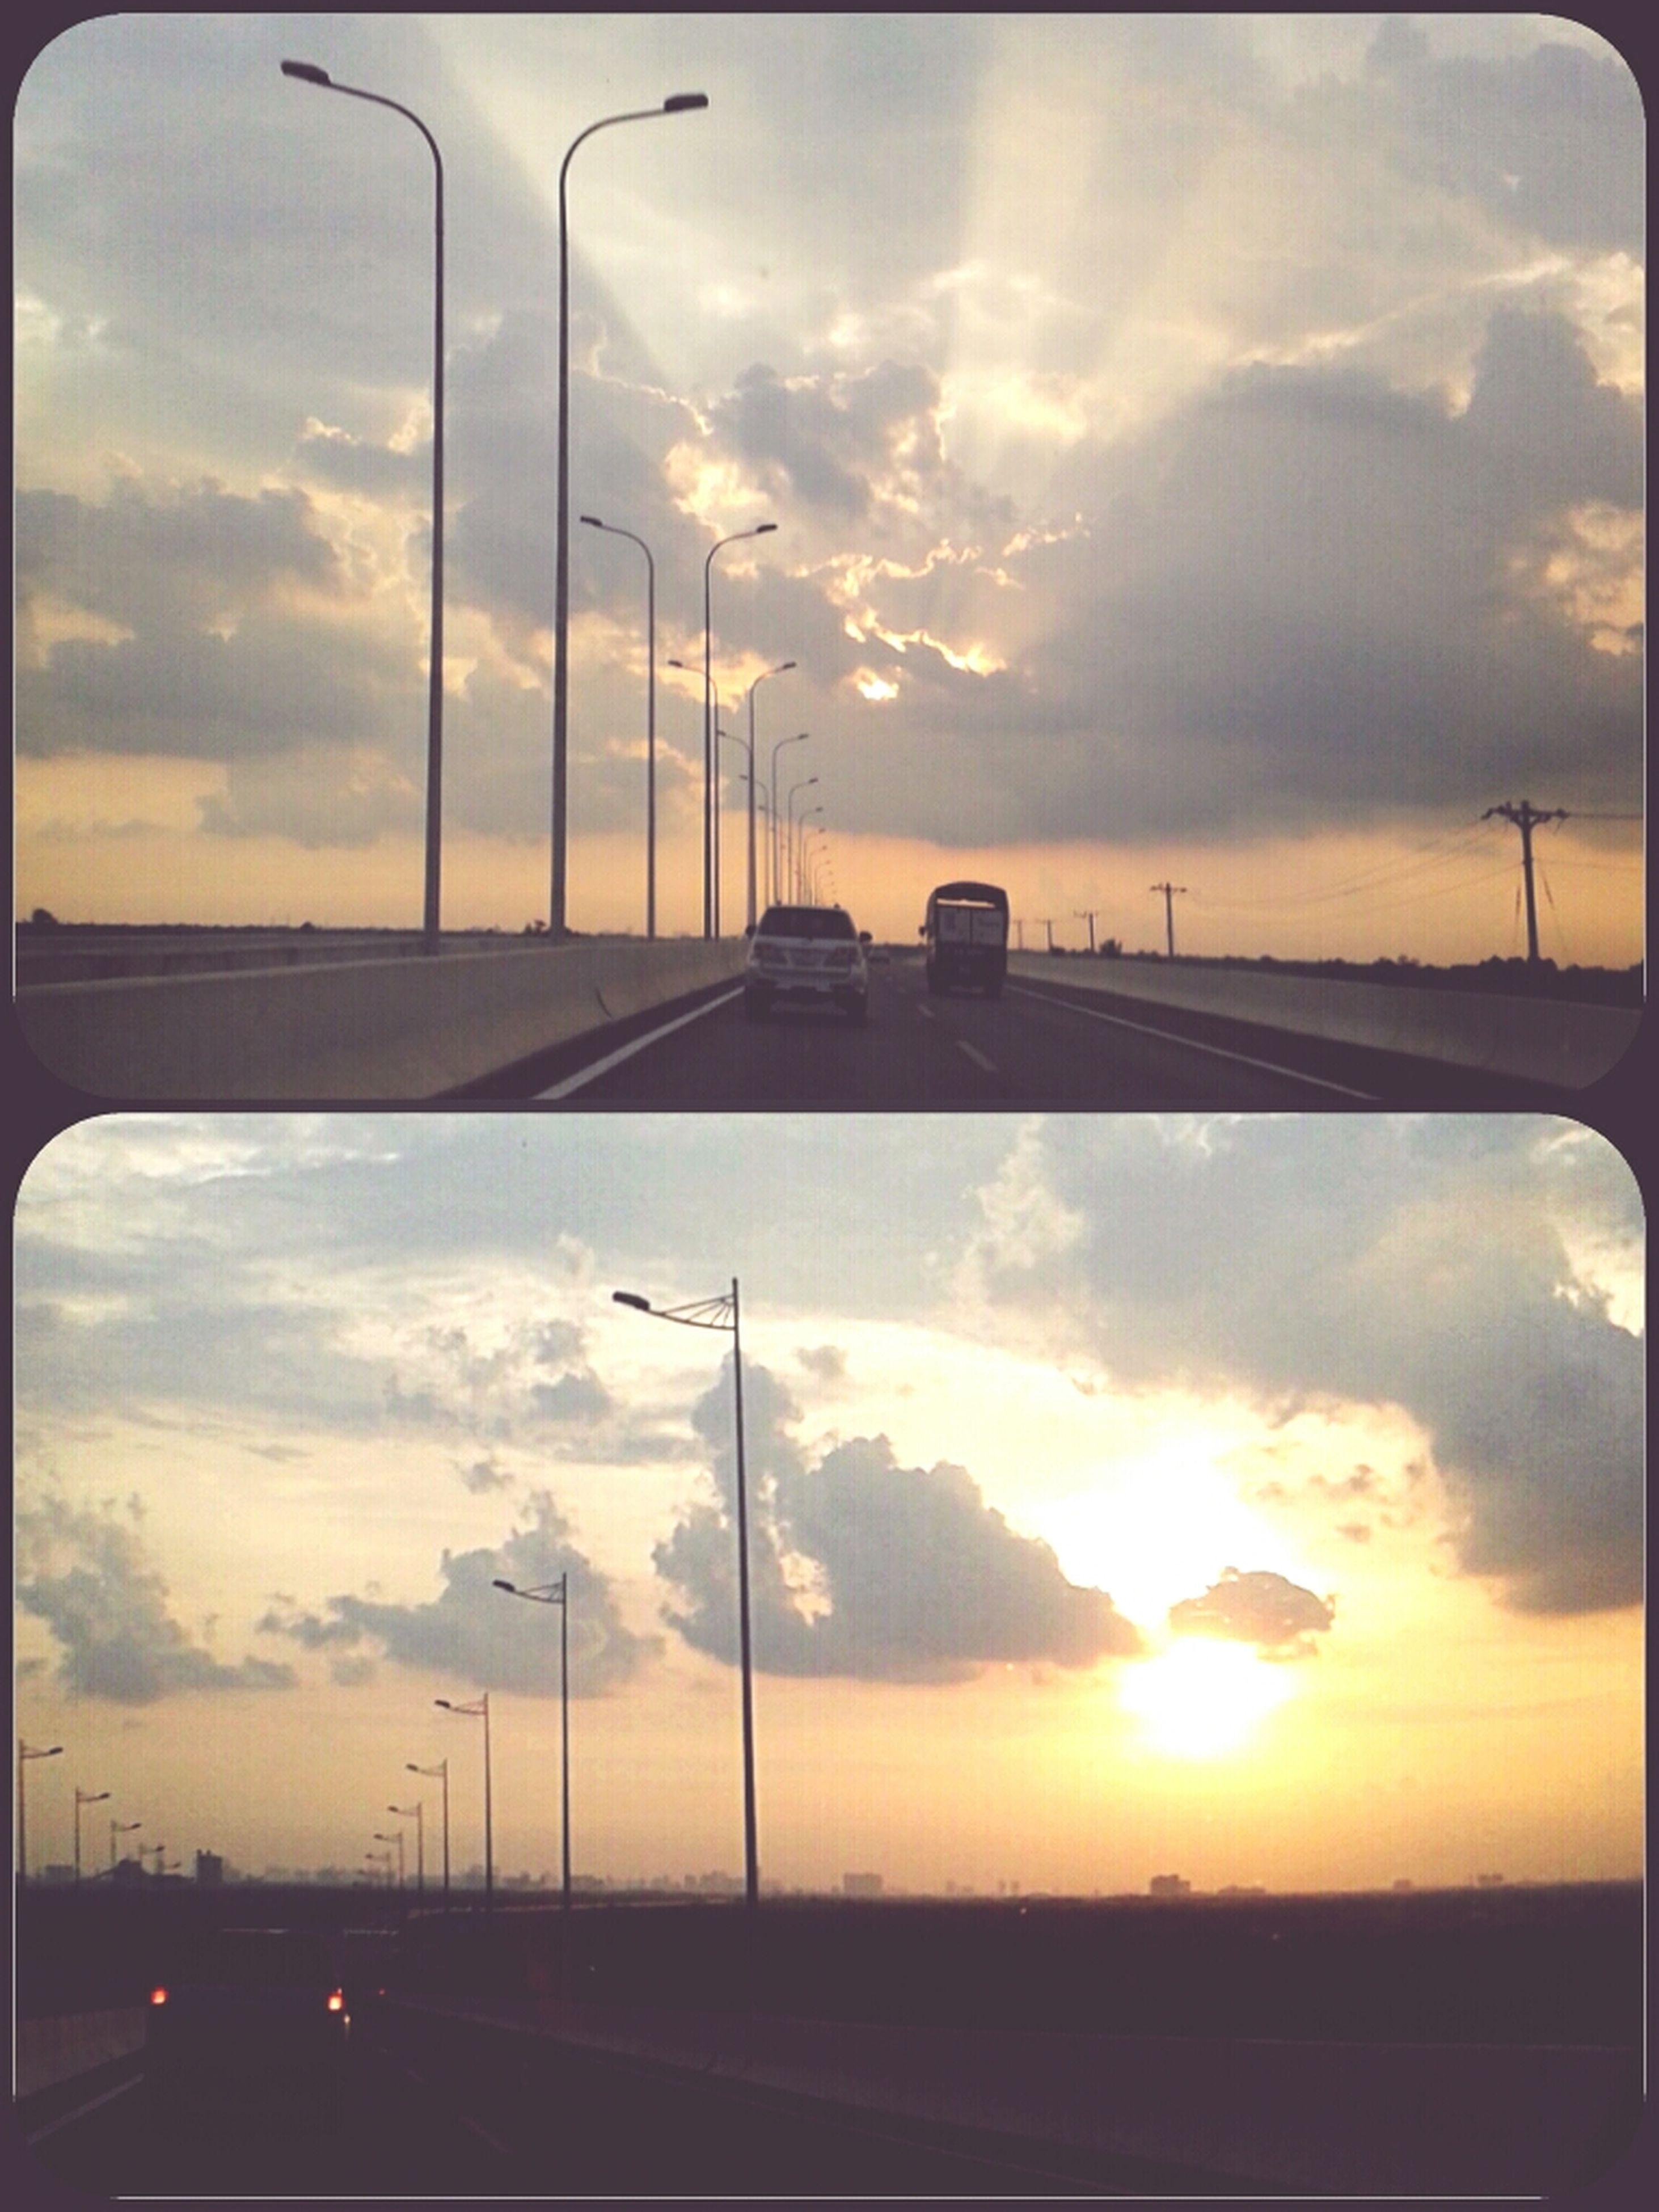 sunset, sky, transportation, cloud - sky, road, car, orange color, street light, cloudy, sun, cloud, the way forward, dramatic sky, land vehicle, silhouette, mode of transport, sunlight, street, diminishing perspective, nature